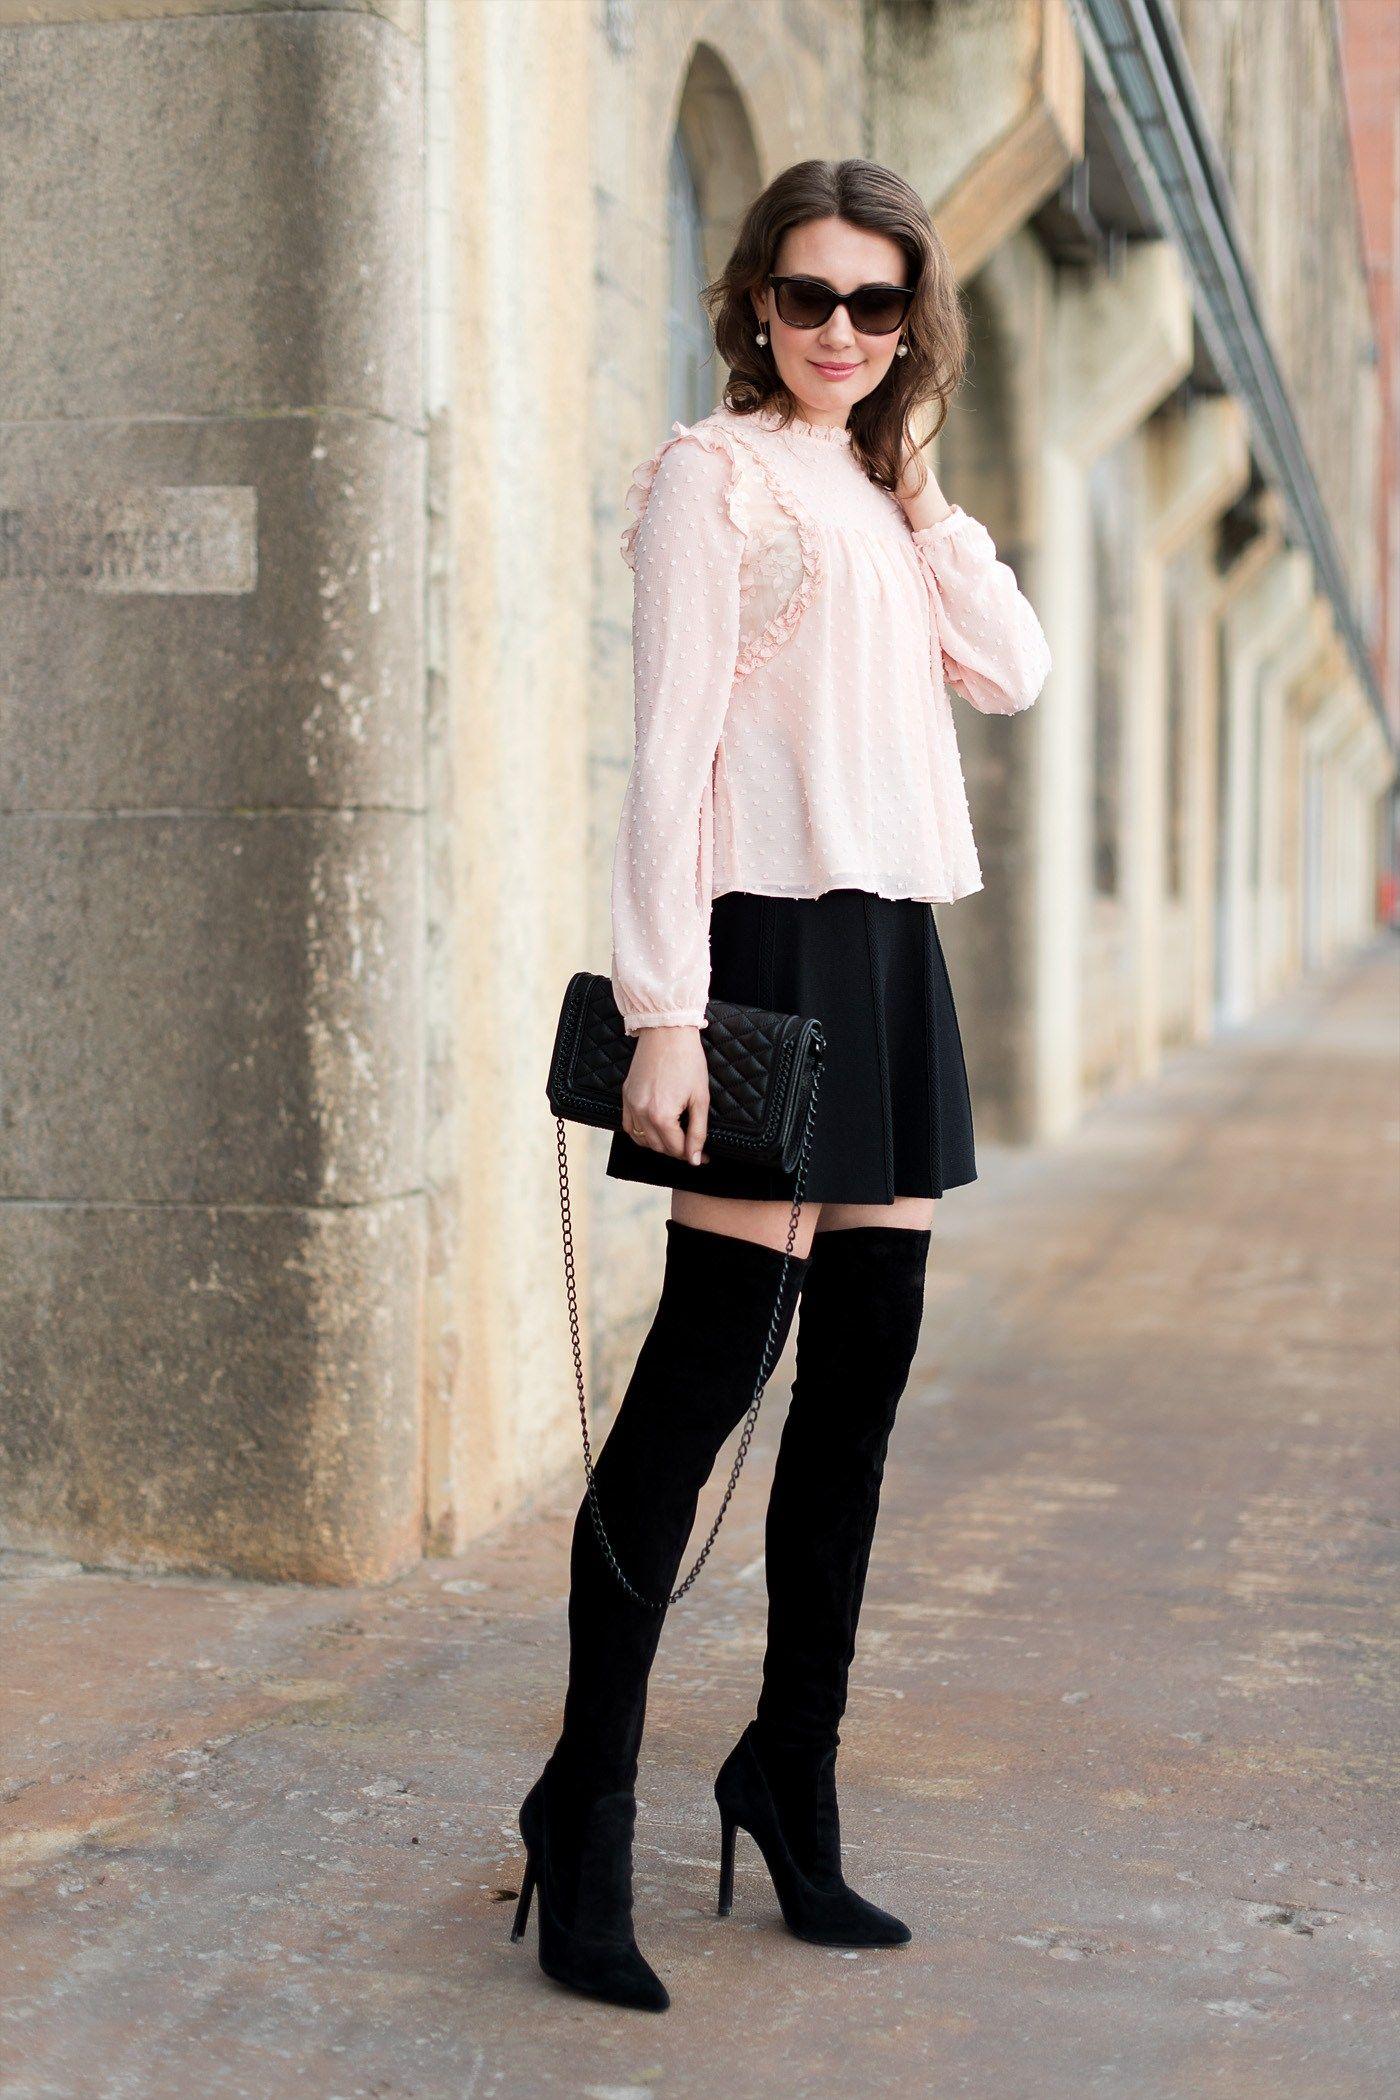 c96d4162540 zara-over-th-knee-boots -blouse-rebecca-minkoff-love-mini-rock-mini-skirt-fashionblog